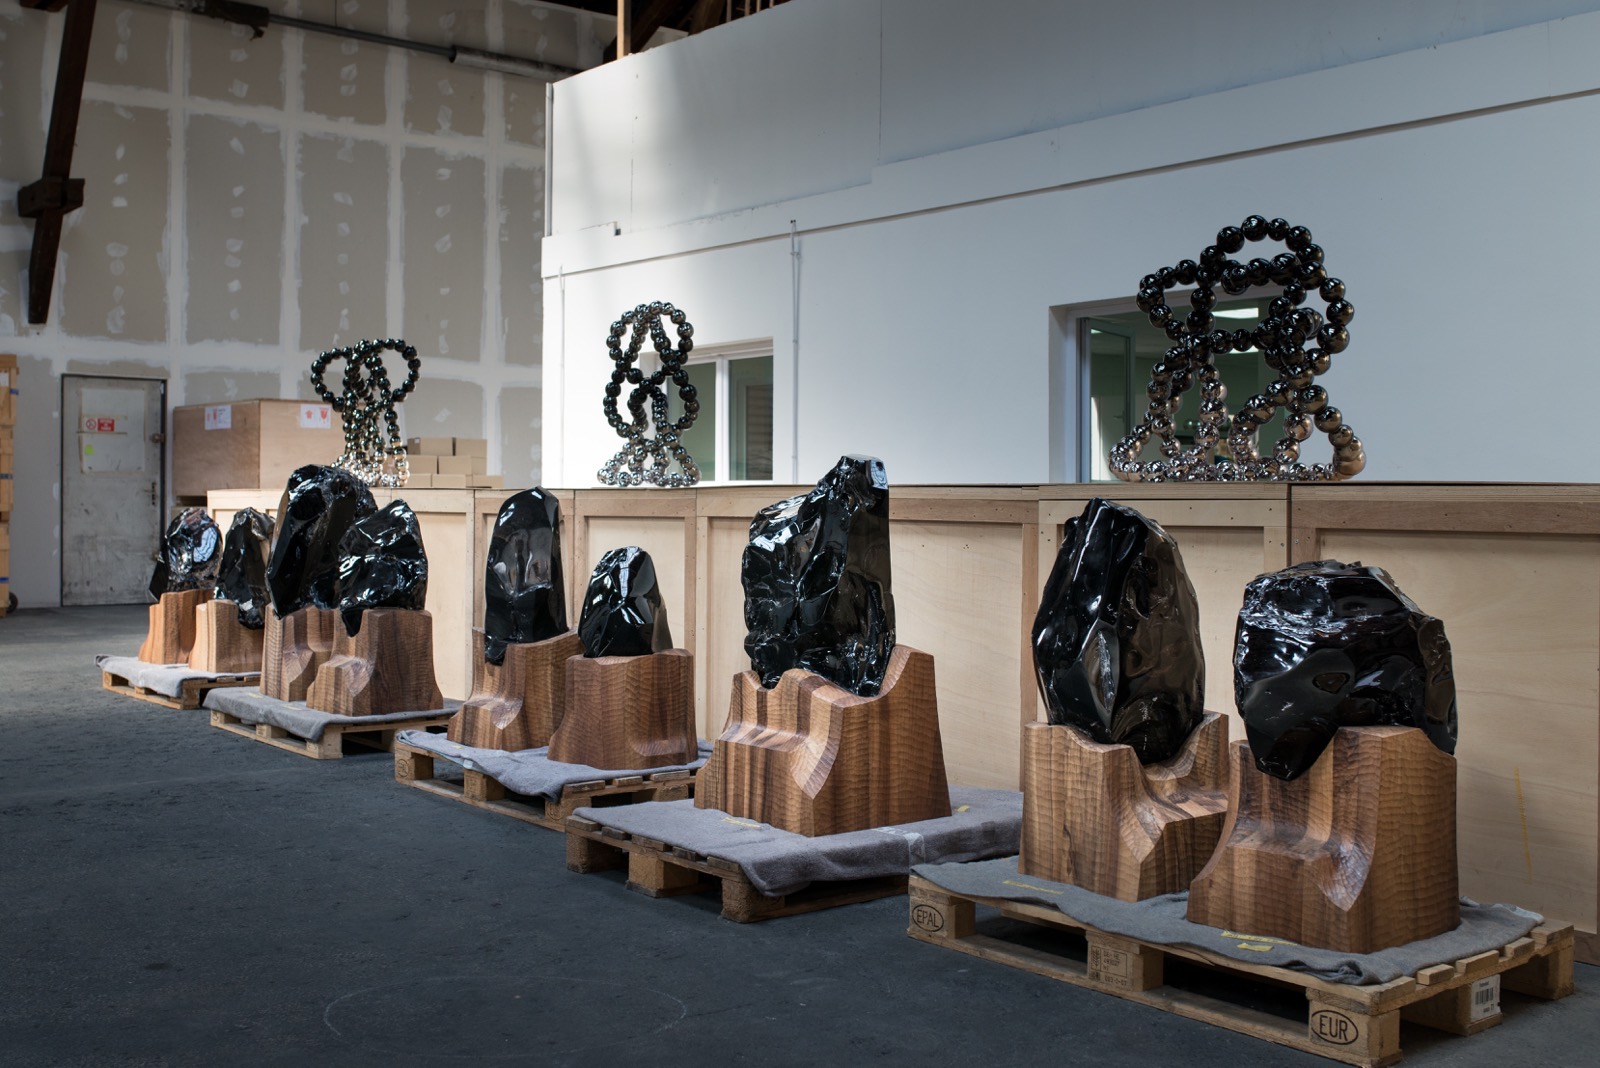 Invisibility Faces, nine quaint and primitive self-portraits made of black obsidian.